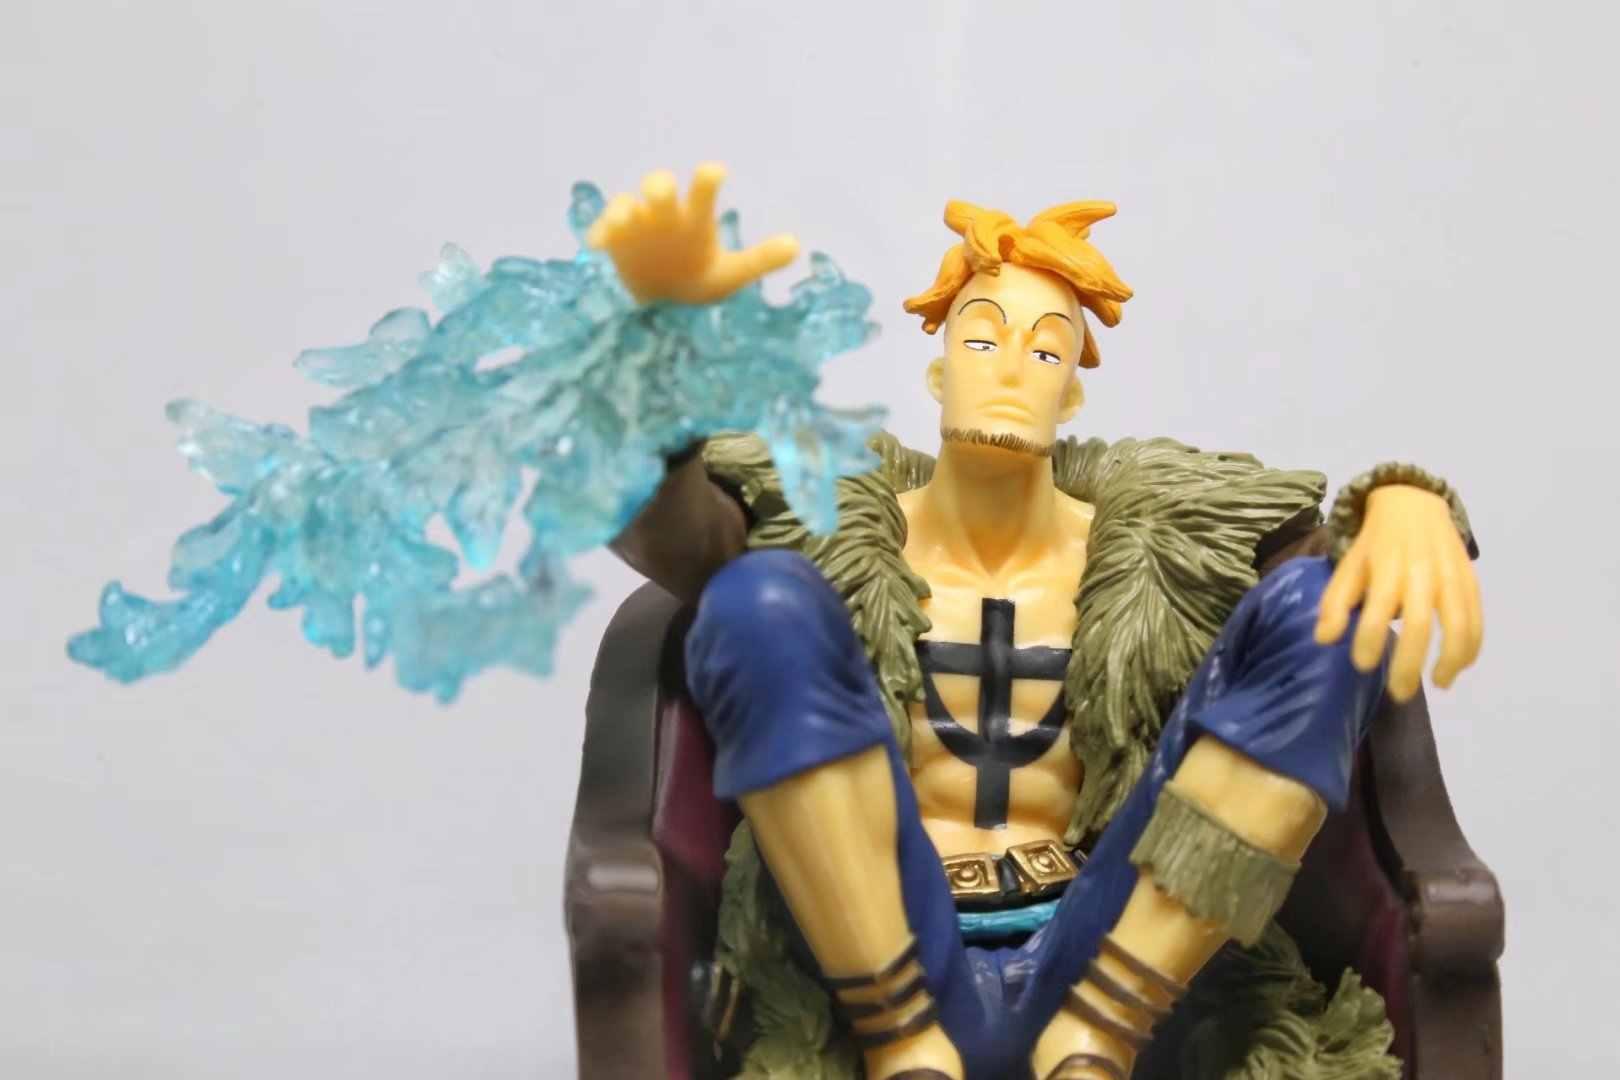 Hot-venda 1 pcs 15 cm anime Japonês figura one piece Marco sentado ver action figure collectible modelo brinquedos brinquedos